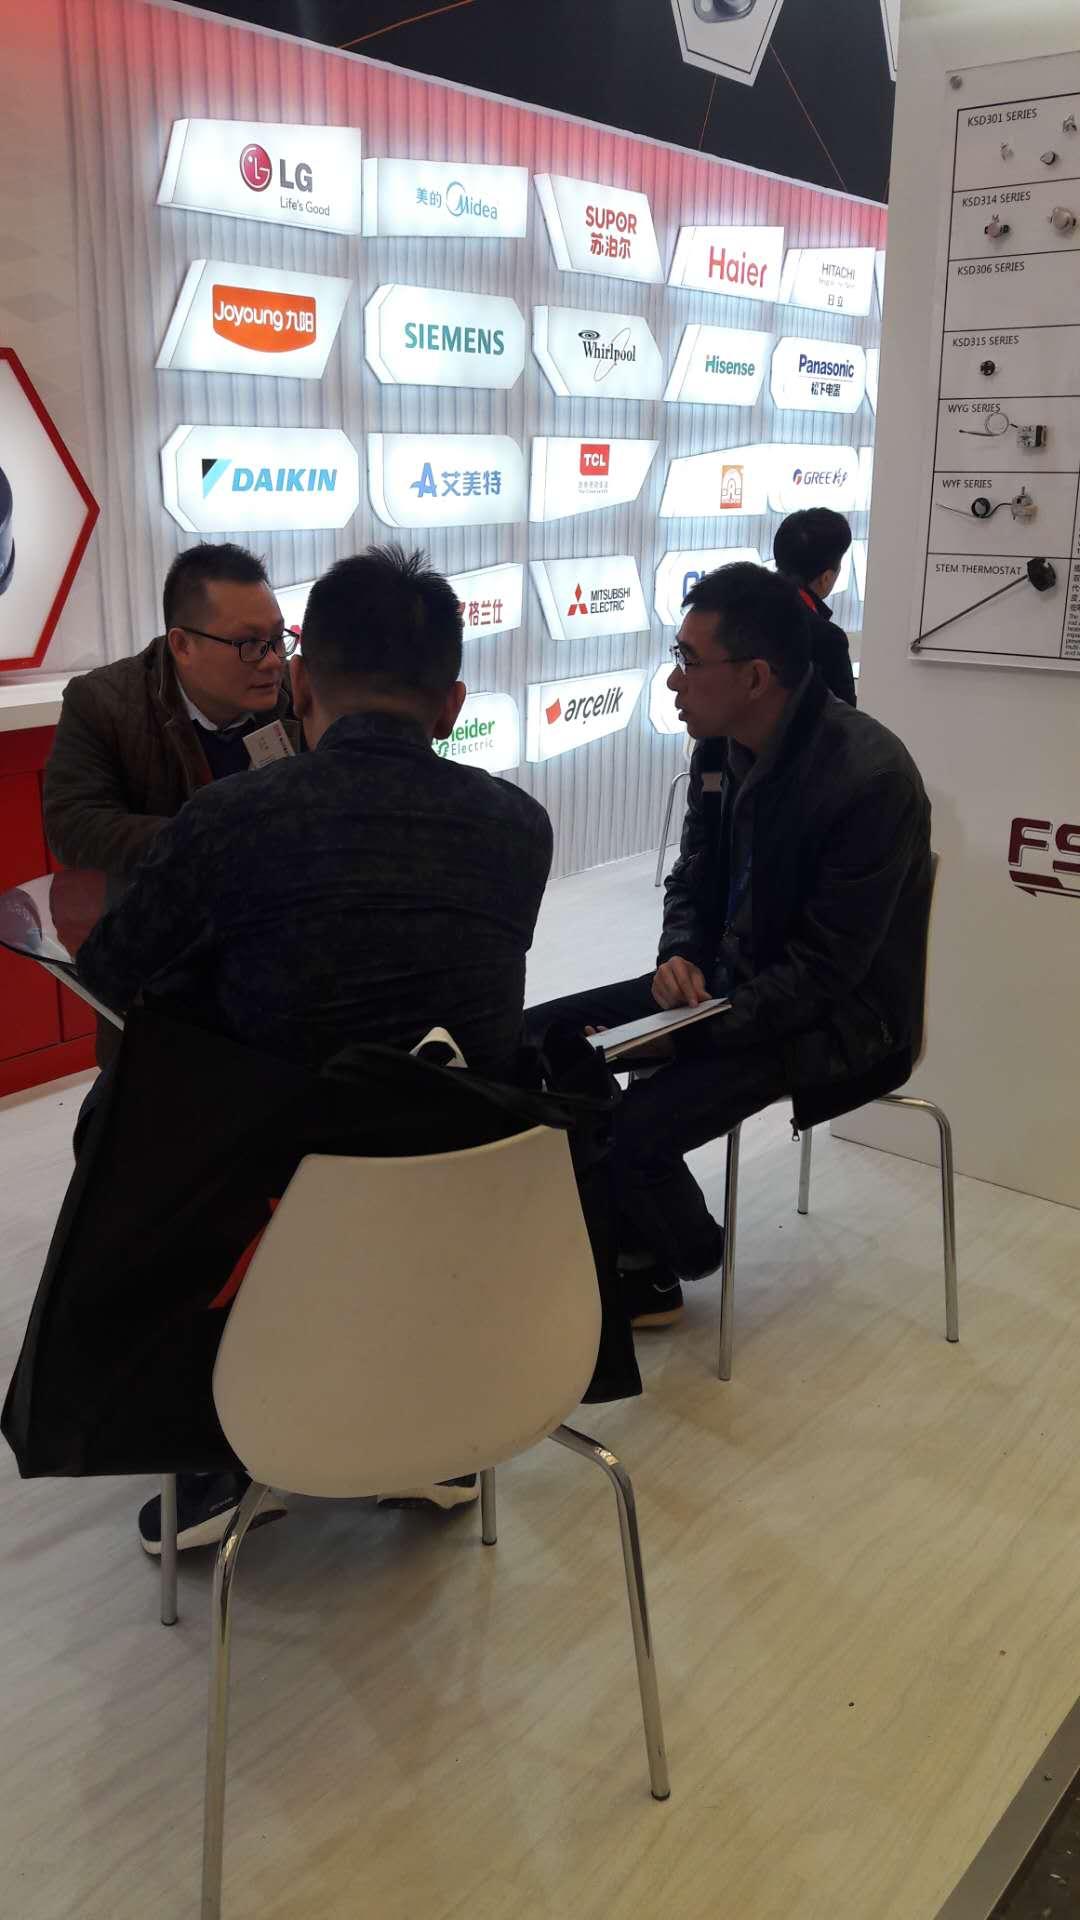 AWE 2018 - Appliance & Electronics World Expo 2018